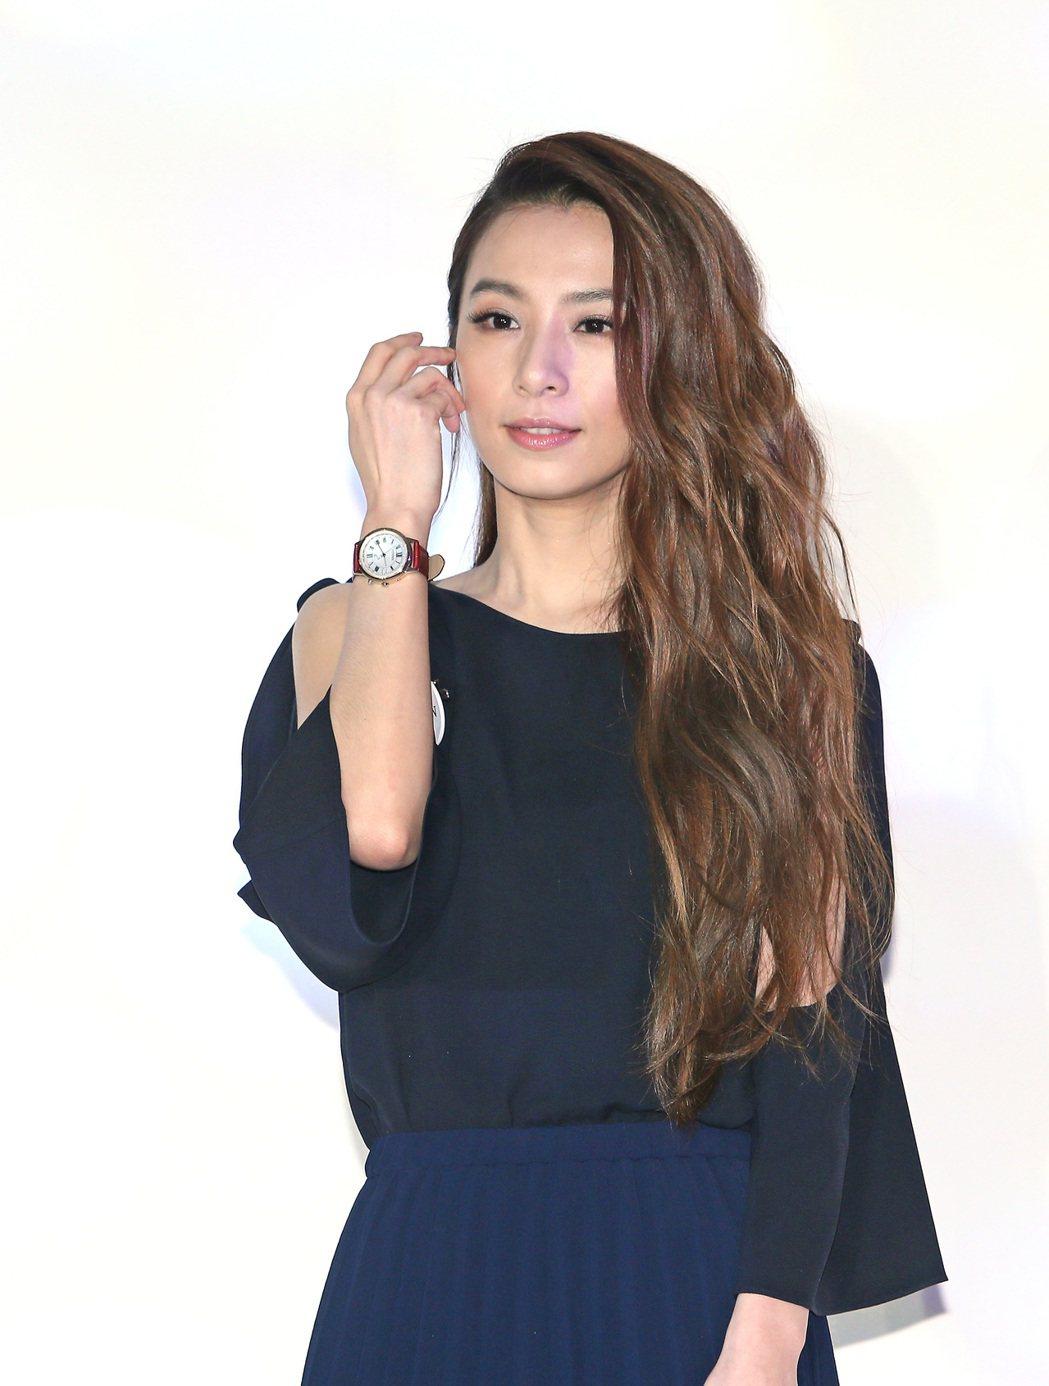 CITIZEN下午舉行女錶新品上市記者會,藝人田馥甄代言。記者陳柏亨/攝影